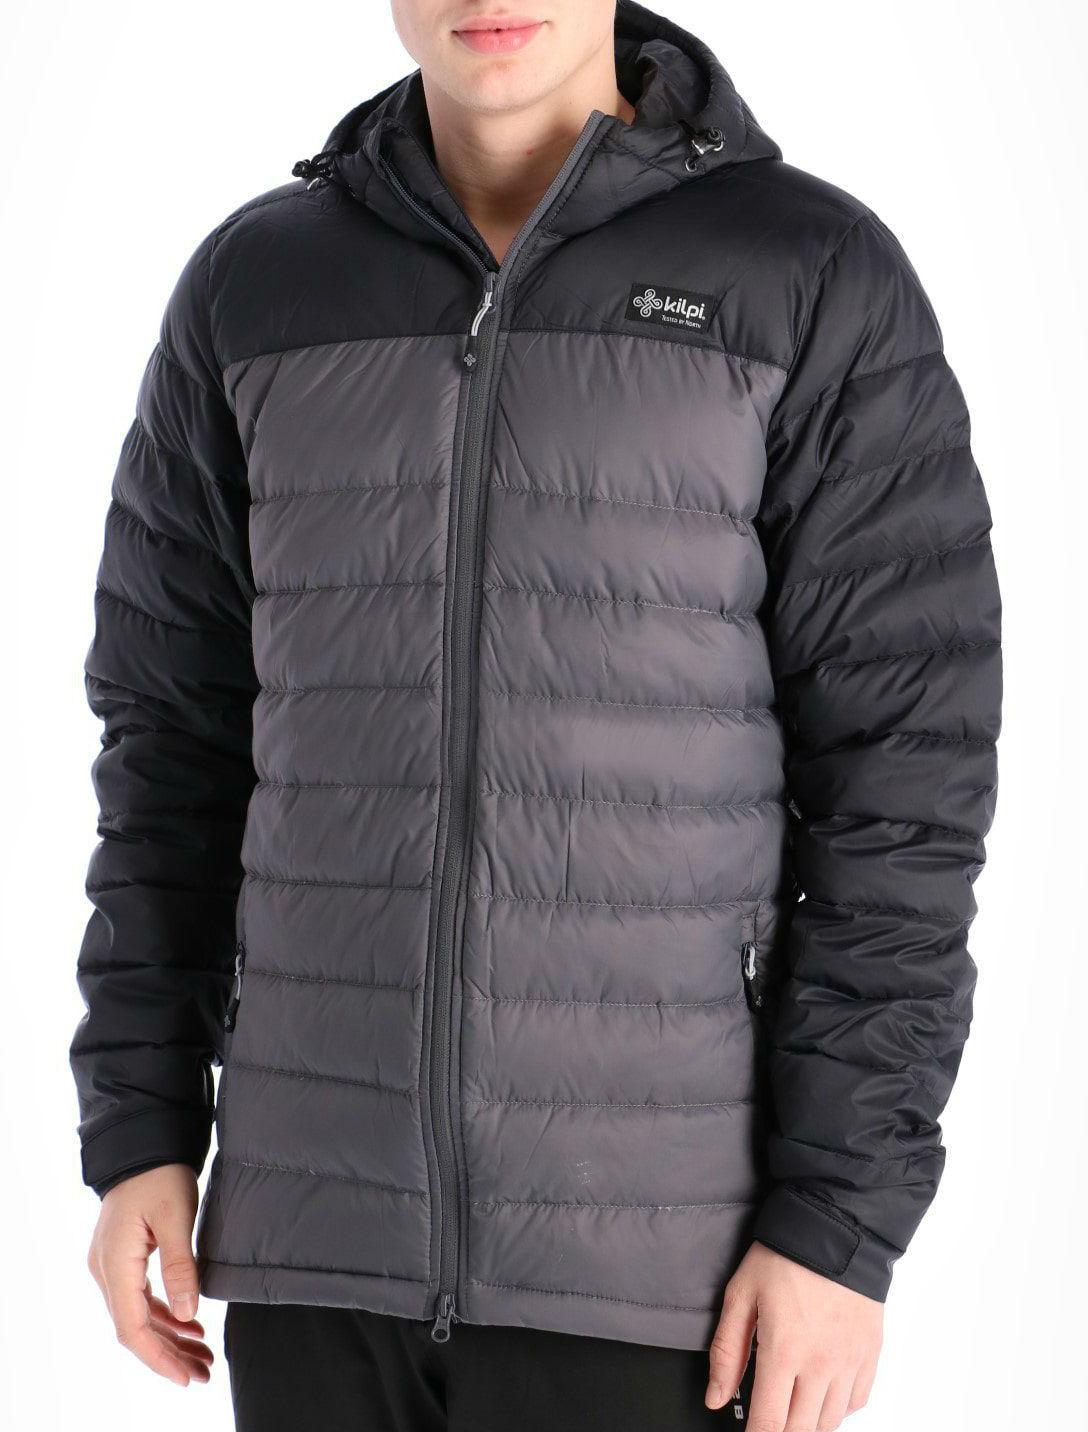 Kilpi Svalbard Insulated Down Jacket, L Dark Grey